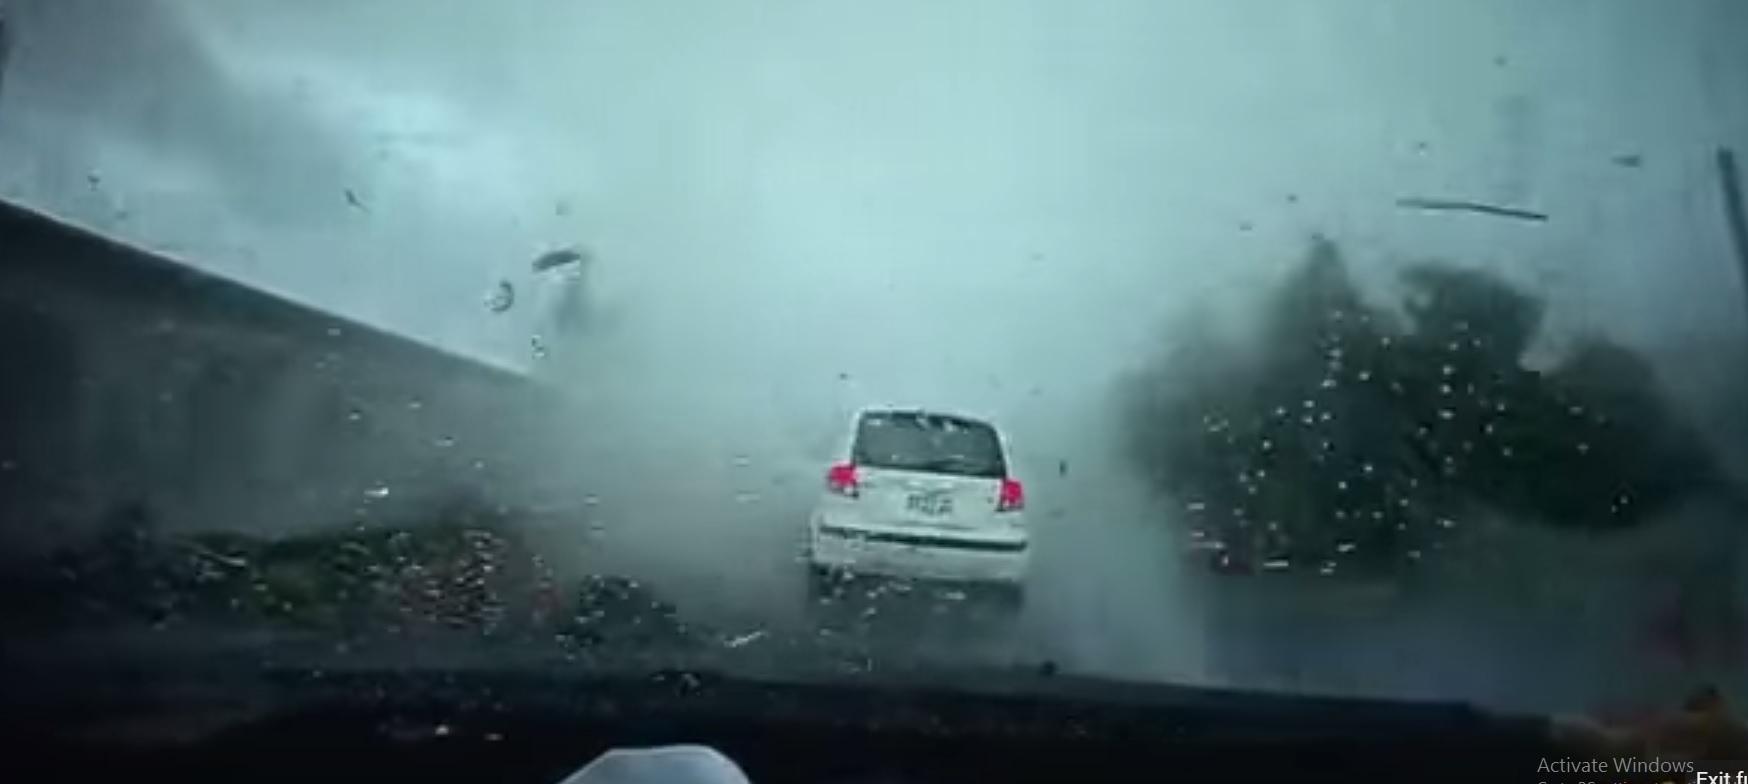 Taiwan Tornado sucks up Hyundai Getz car- Dash cam recording